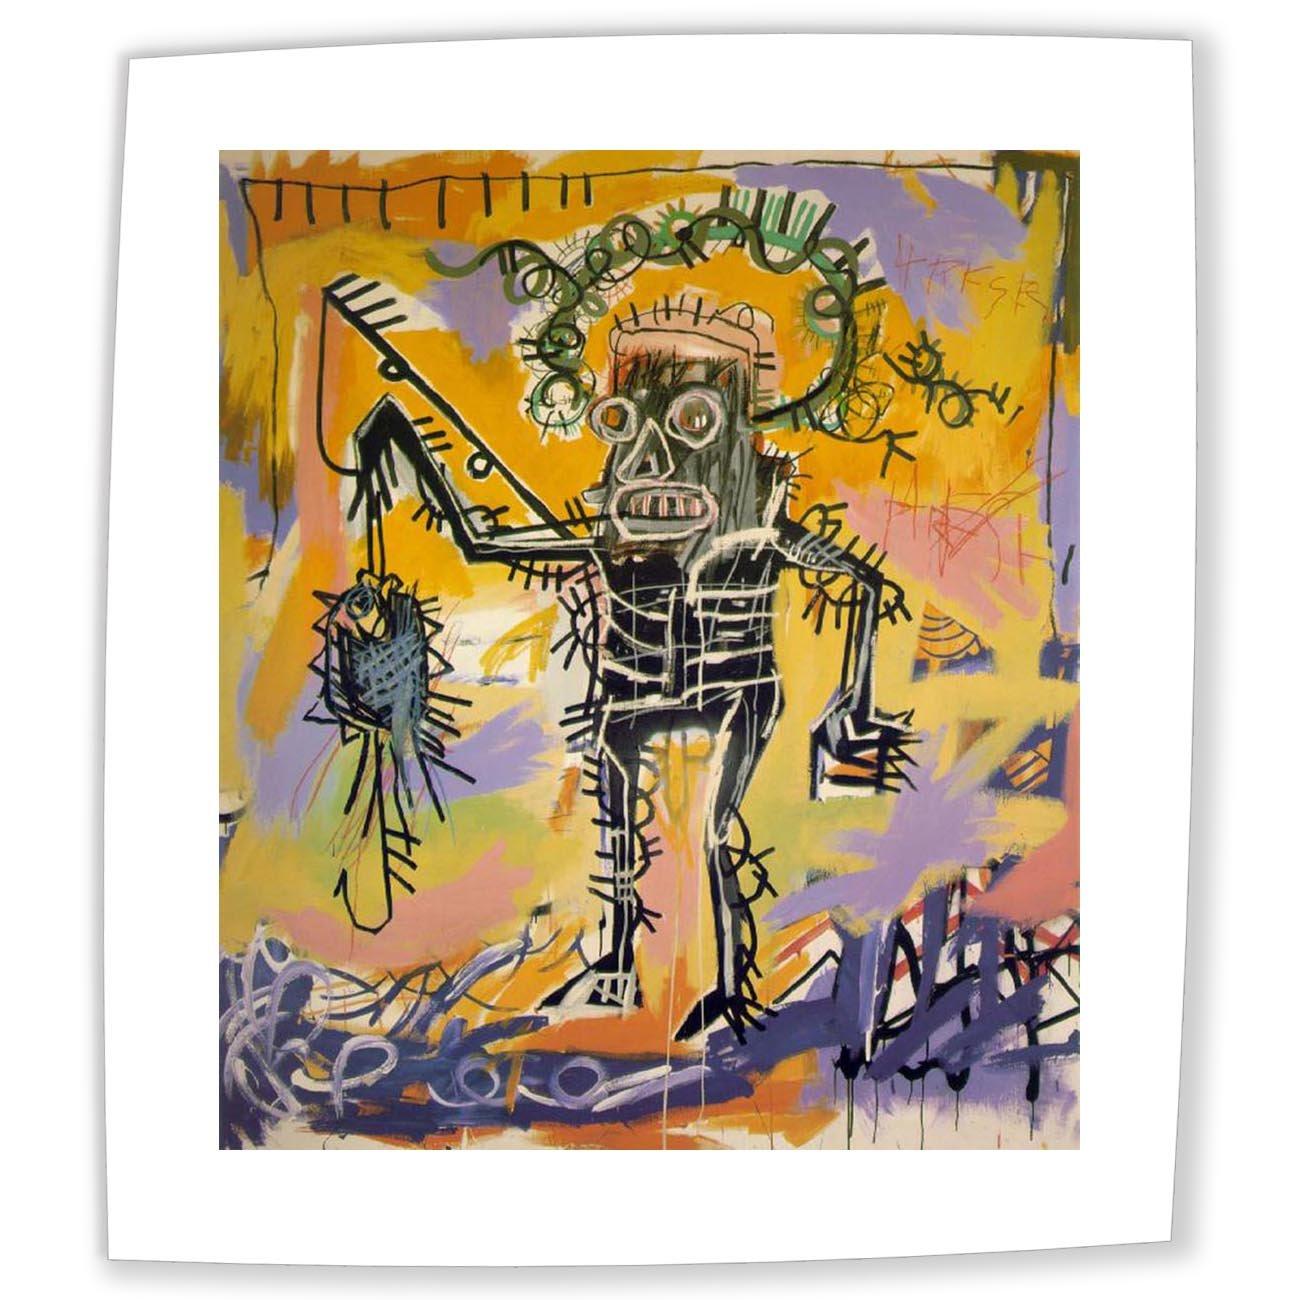 Amazon.com: Neron Art Jean-Michel Basquiat Fishing 1981 - Original ...